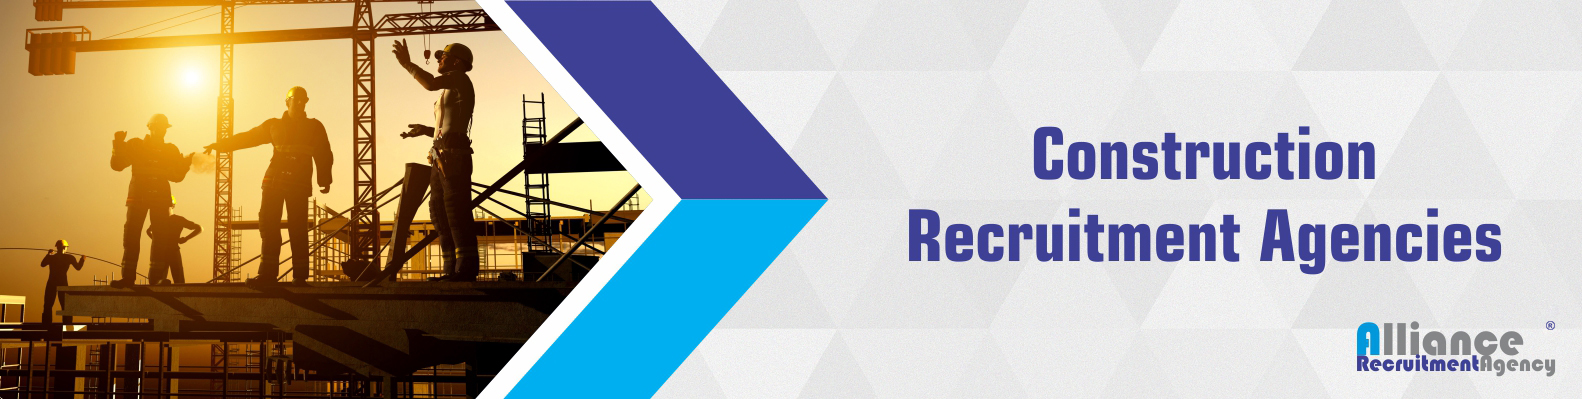 Construction Recruitment Agencies - Construction Staffing Agencies